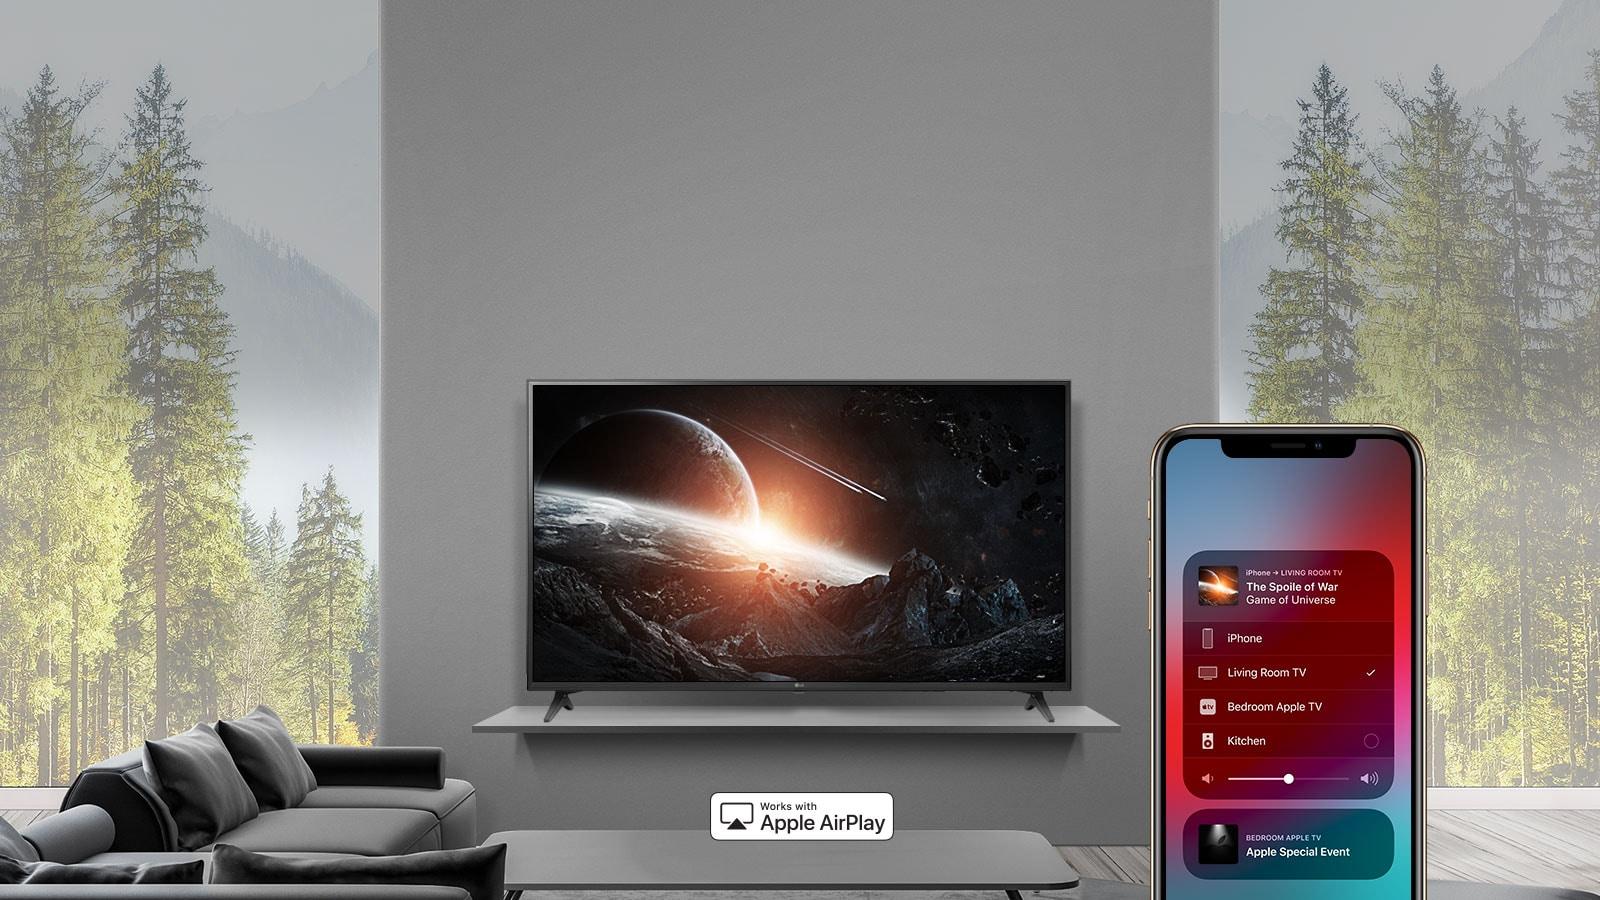 Video Caminetto Per Tv lg 43 inch class 4k hdr smart led tv (42.5'' diag)